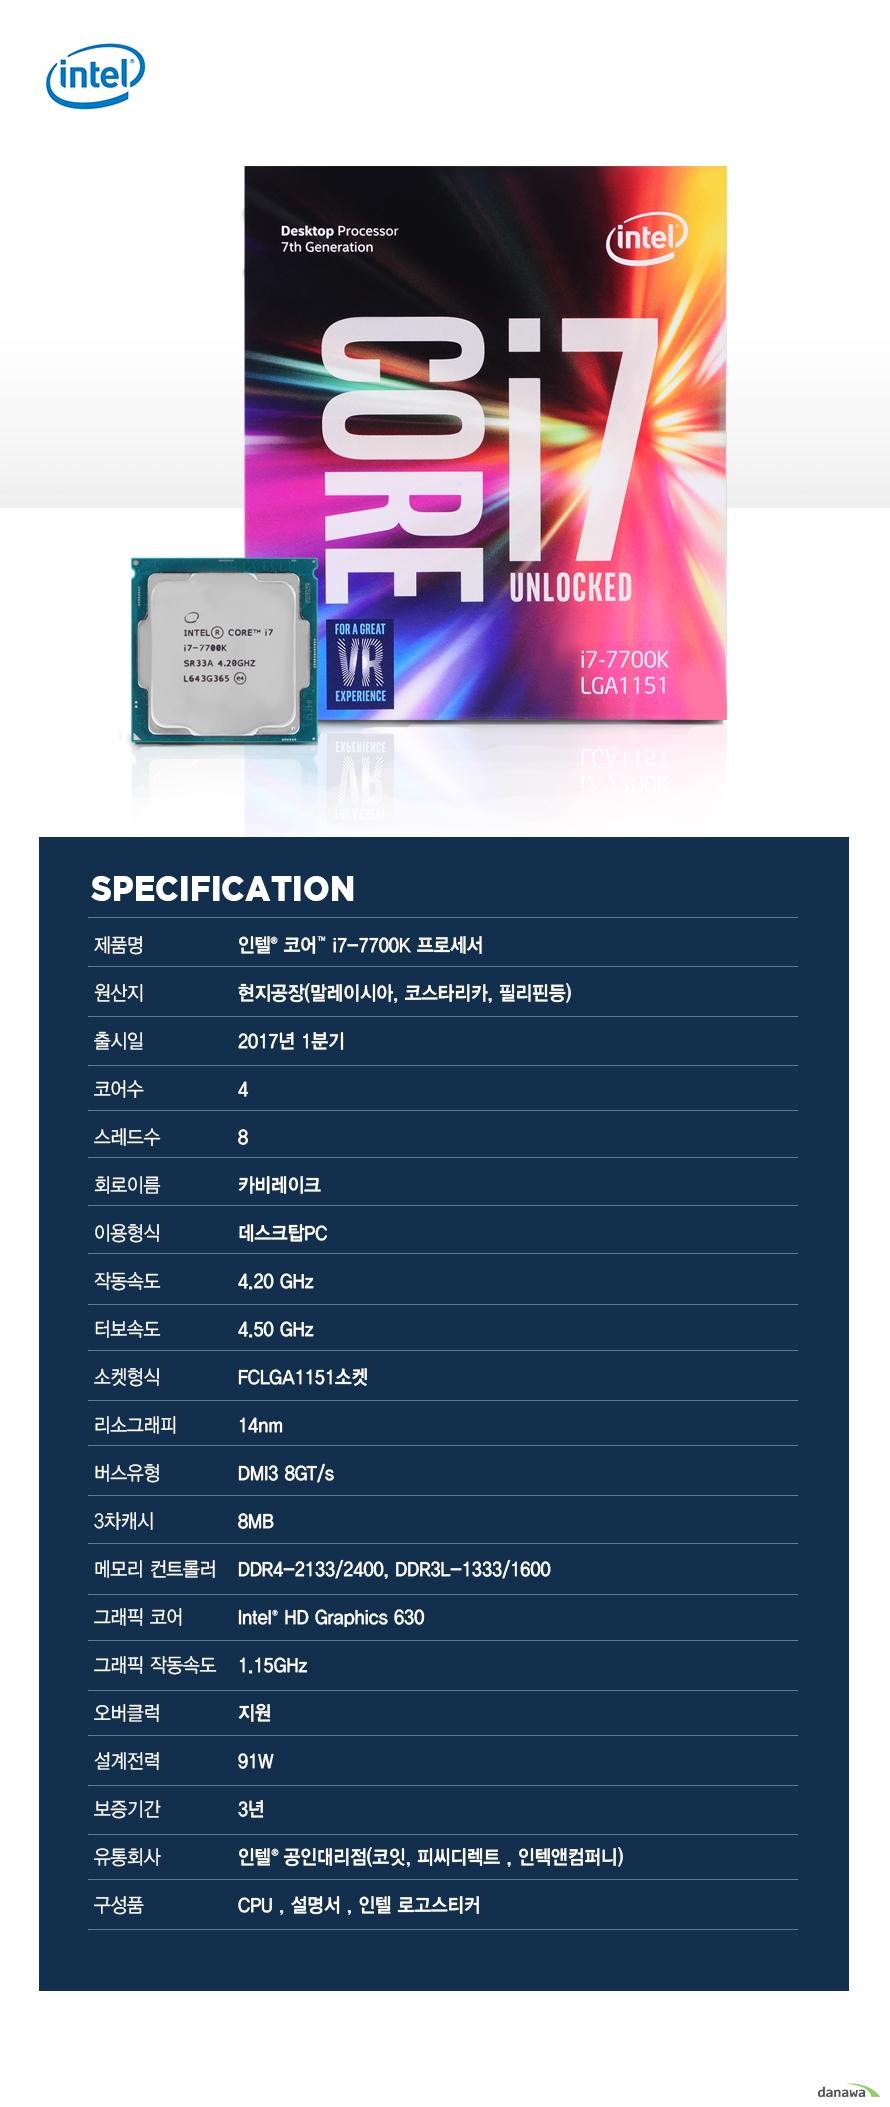 SPECIFICATION                제품명 인텔 코어 i7 - 7700K 프로세서                        원산지 현지공장 말레이시아 코스타리카 필리핀등                출시일 2017년 1분기                코어수 4                스레드수 8                 회로이름 카비레이크                이용형식 데스크탑PC                작동속도 4.20GHZ                터보속도 4.50GHZ                소켓형식 FCLGA1151소켓                리소그래피 14NM                버스유형 DMI3 8GT/S                3차캐시 8MB                메모리 컨트롤러 DDR4-2133/2400 DDR3L-1333/1600                그래픽 코어 INTEL HD GRAPHICS 630                그래픽 작동속도 1.15GHZ                오버클럭 지원                설계전력 91W                보증기간 3년                유통회사 인텔 공인대리점 코잇 피씨디렉트 인텍엔 컴퍼니                구성품 CPU 설명서 인텔 로고스티커